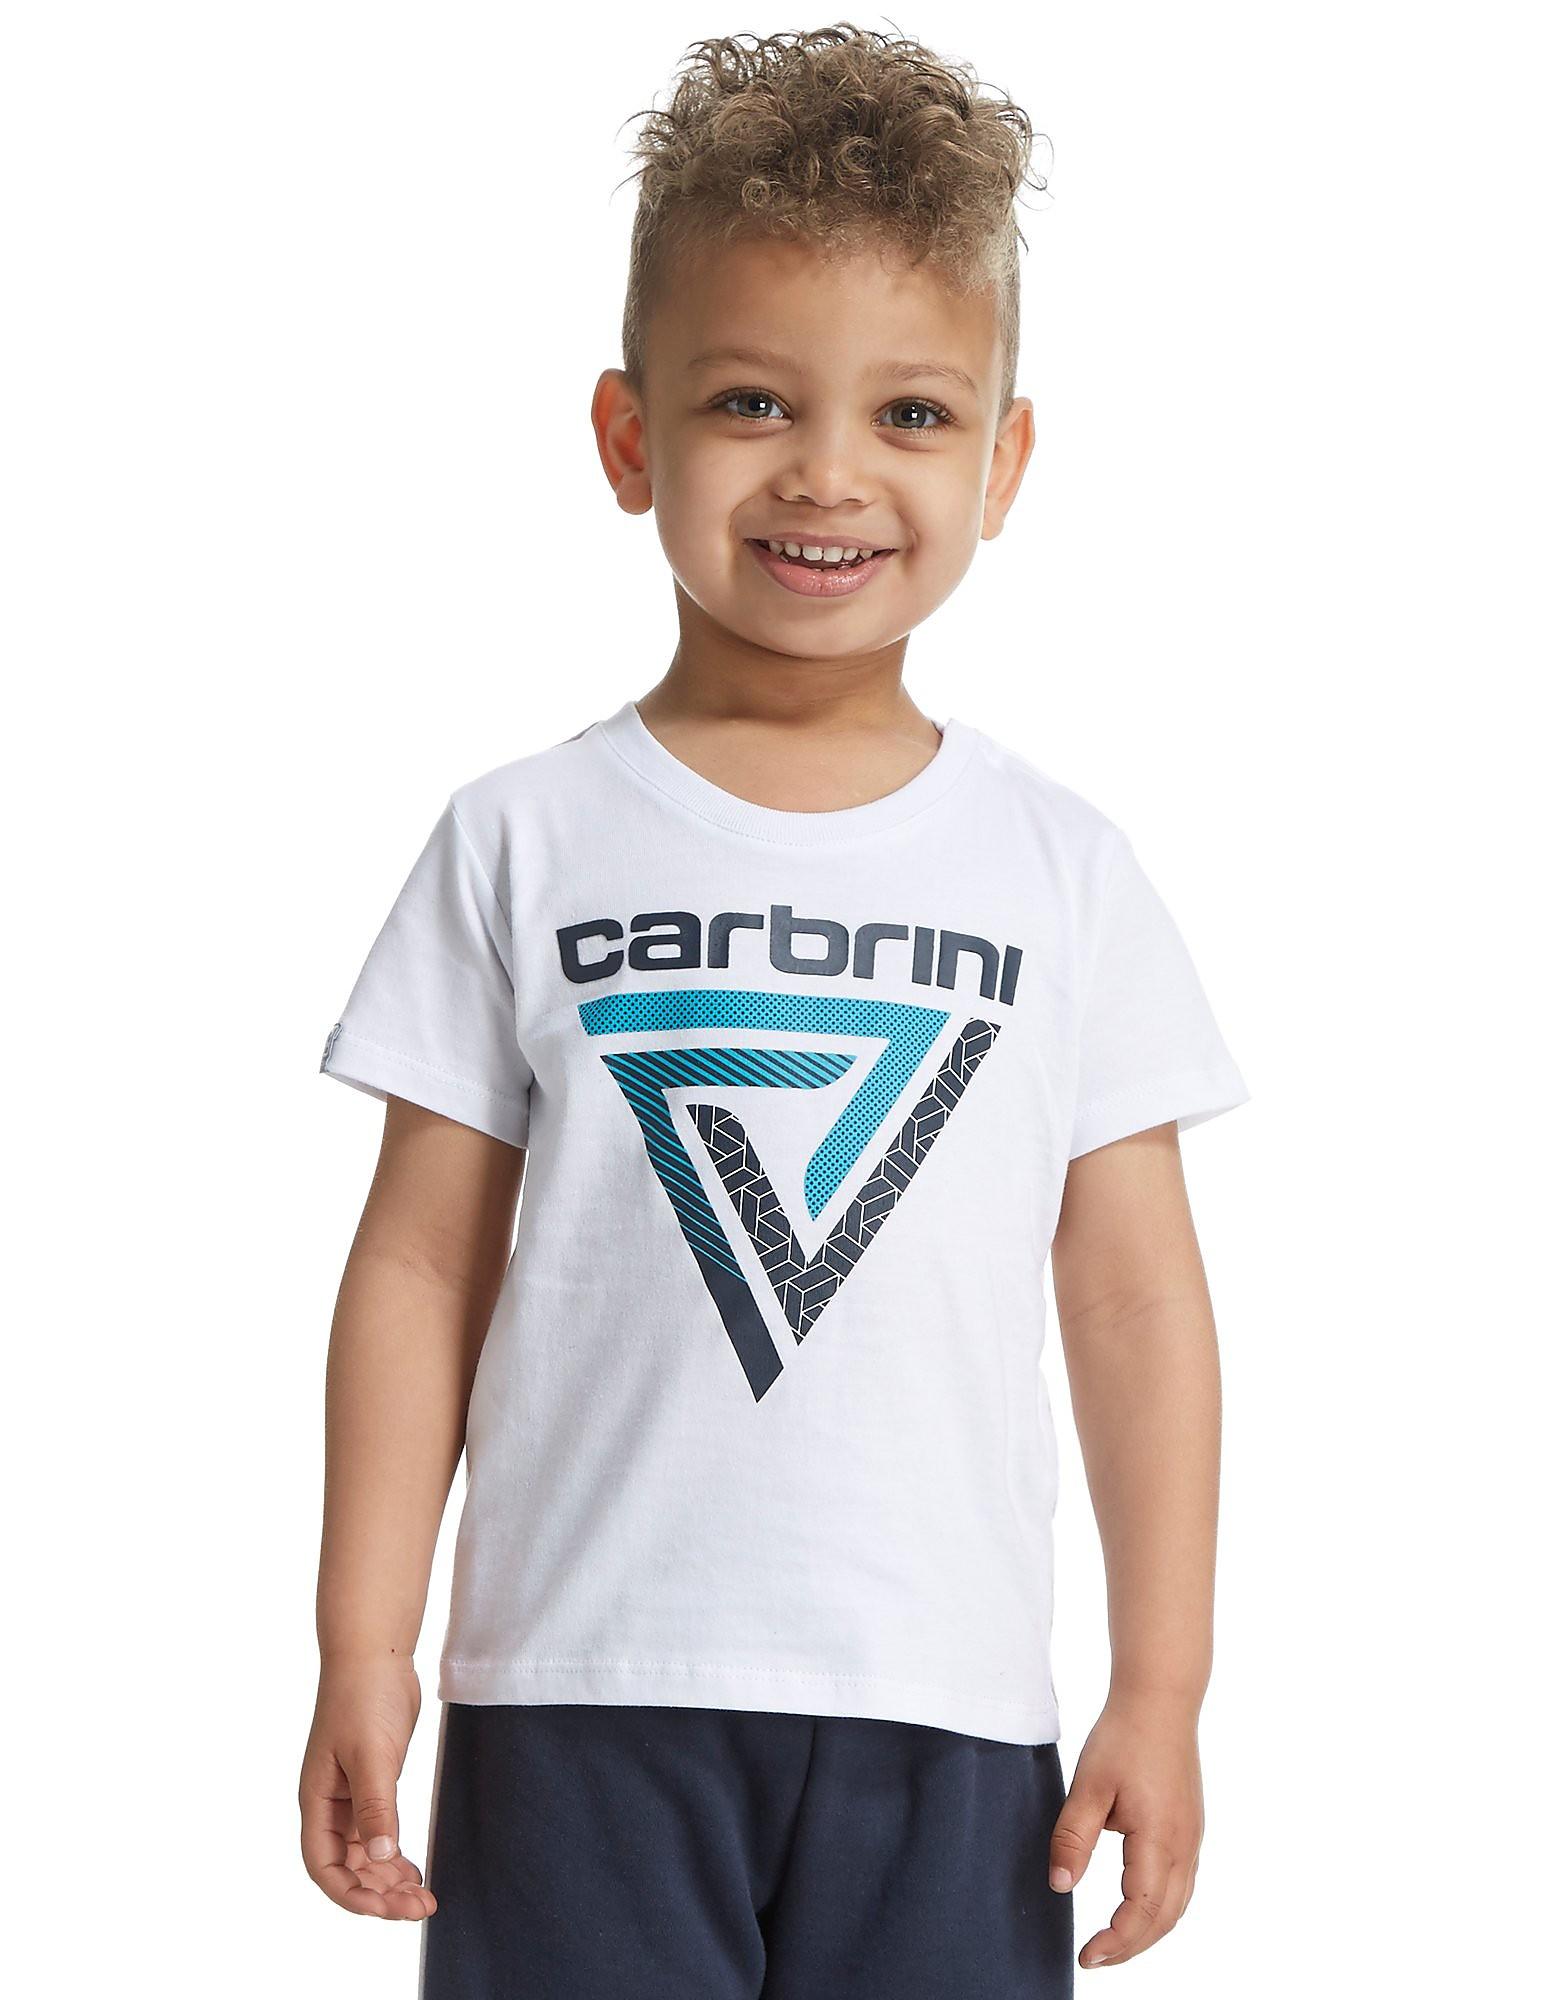 Carbrini Curzon t-shirt småbørn